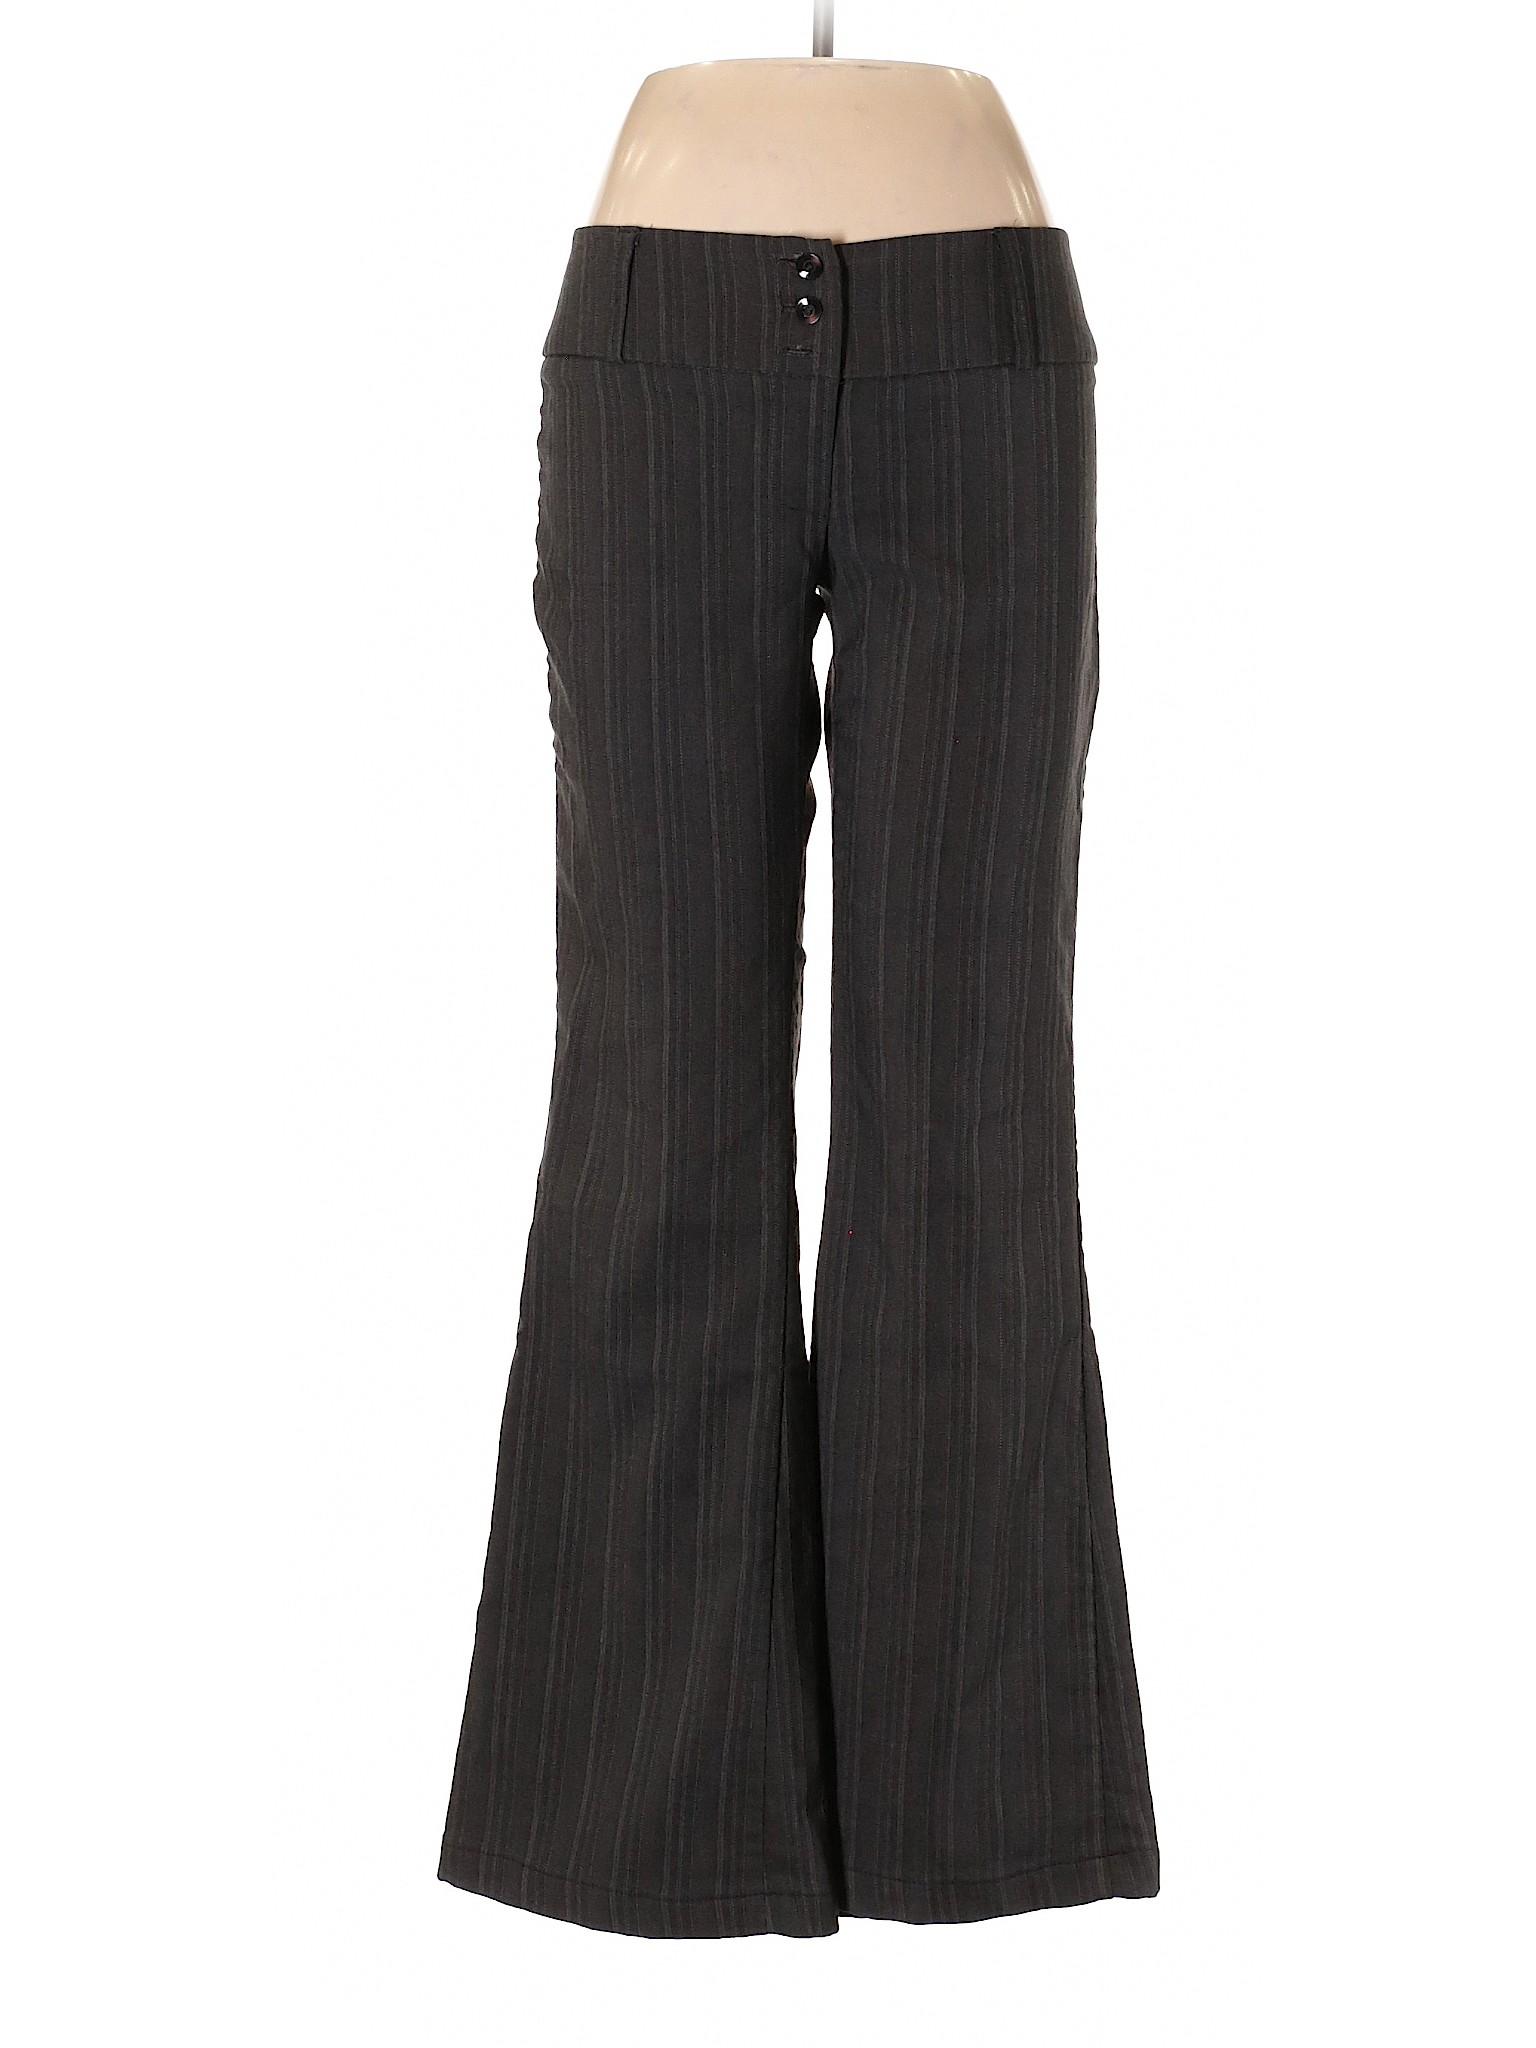 Pants Leisure Street Dress Cleveland winter TRwqHf